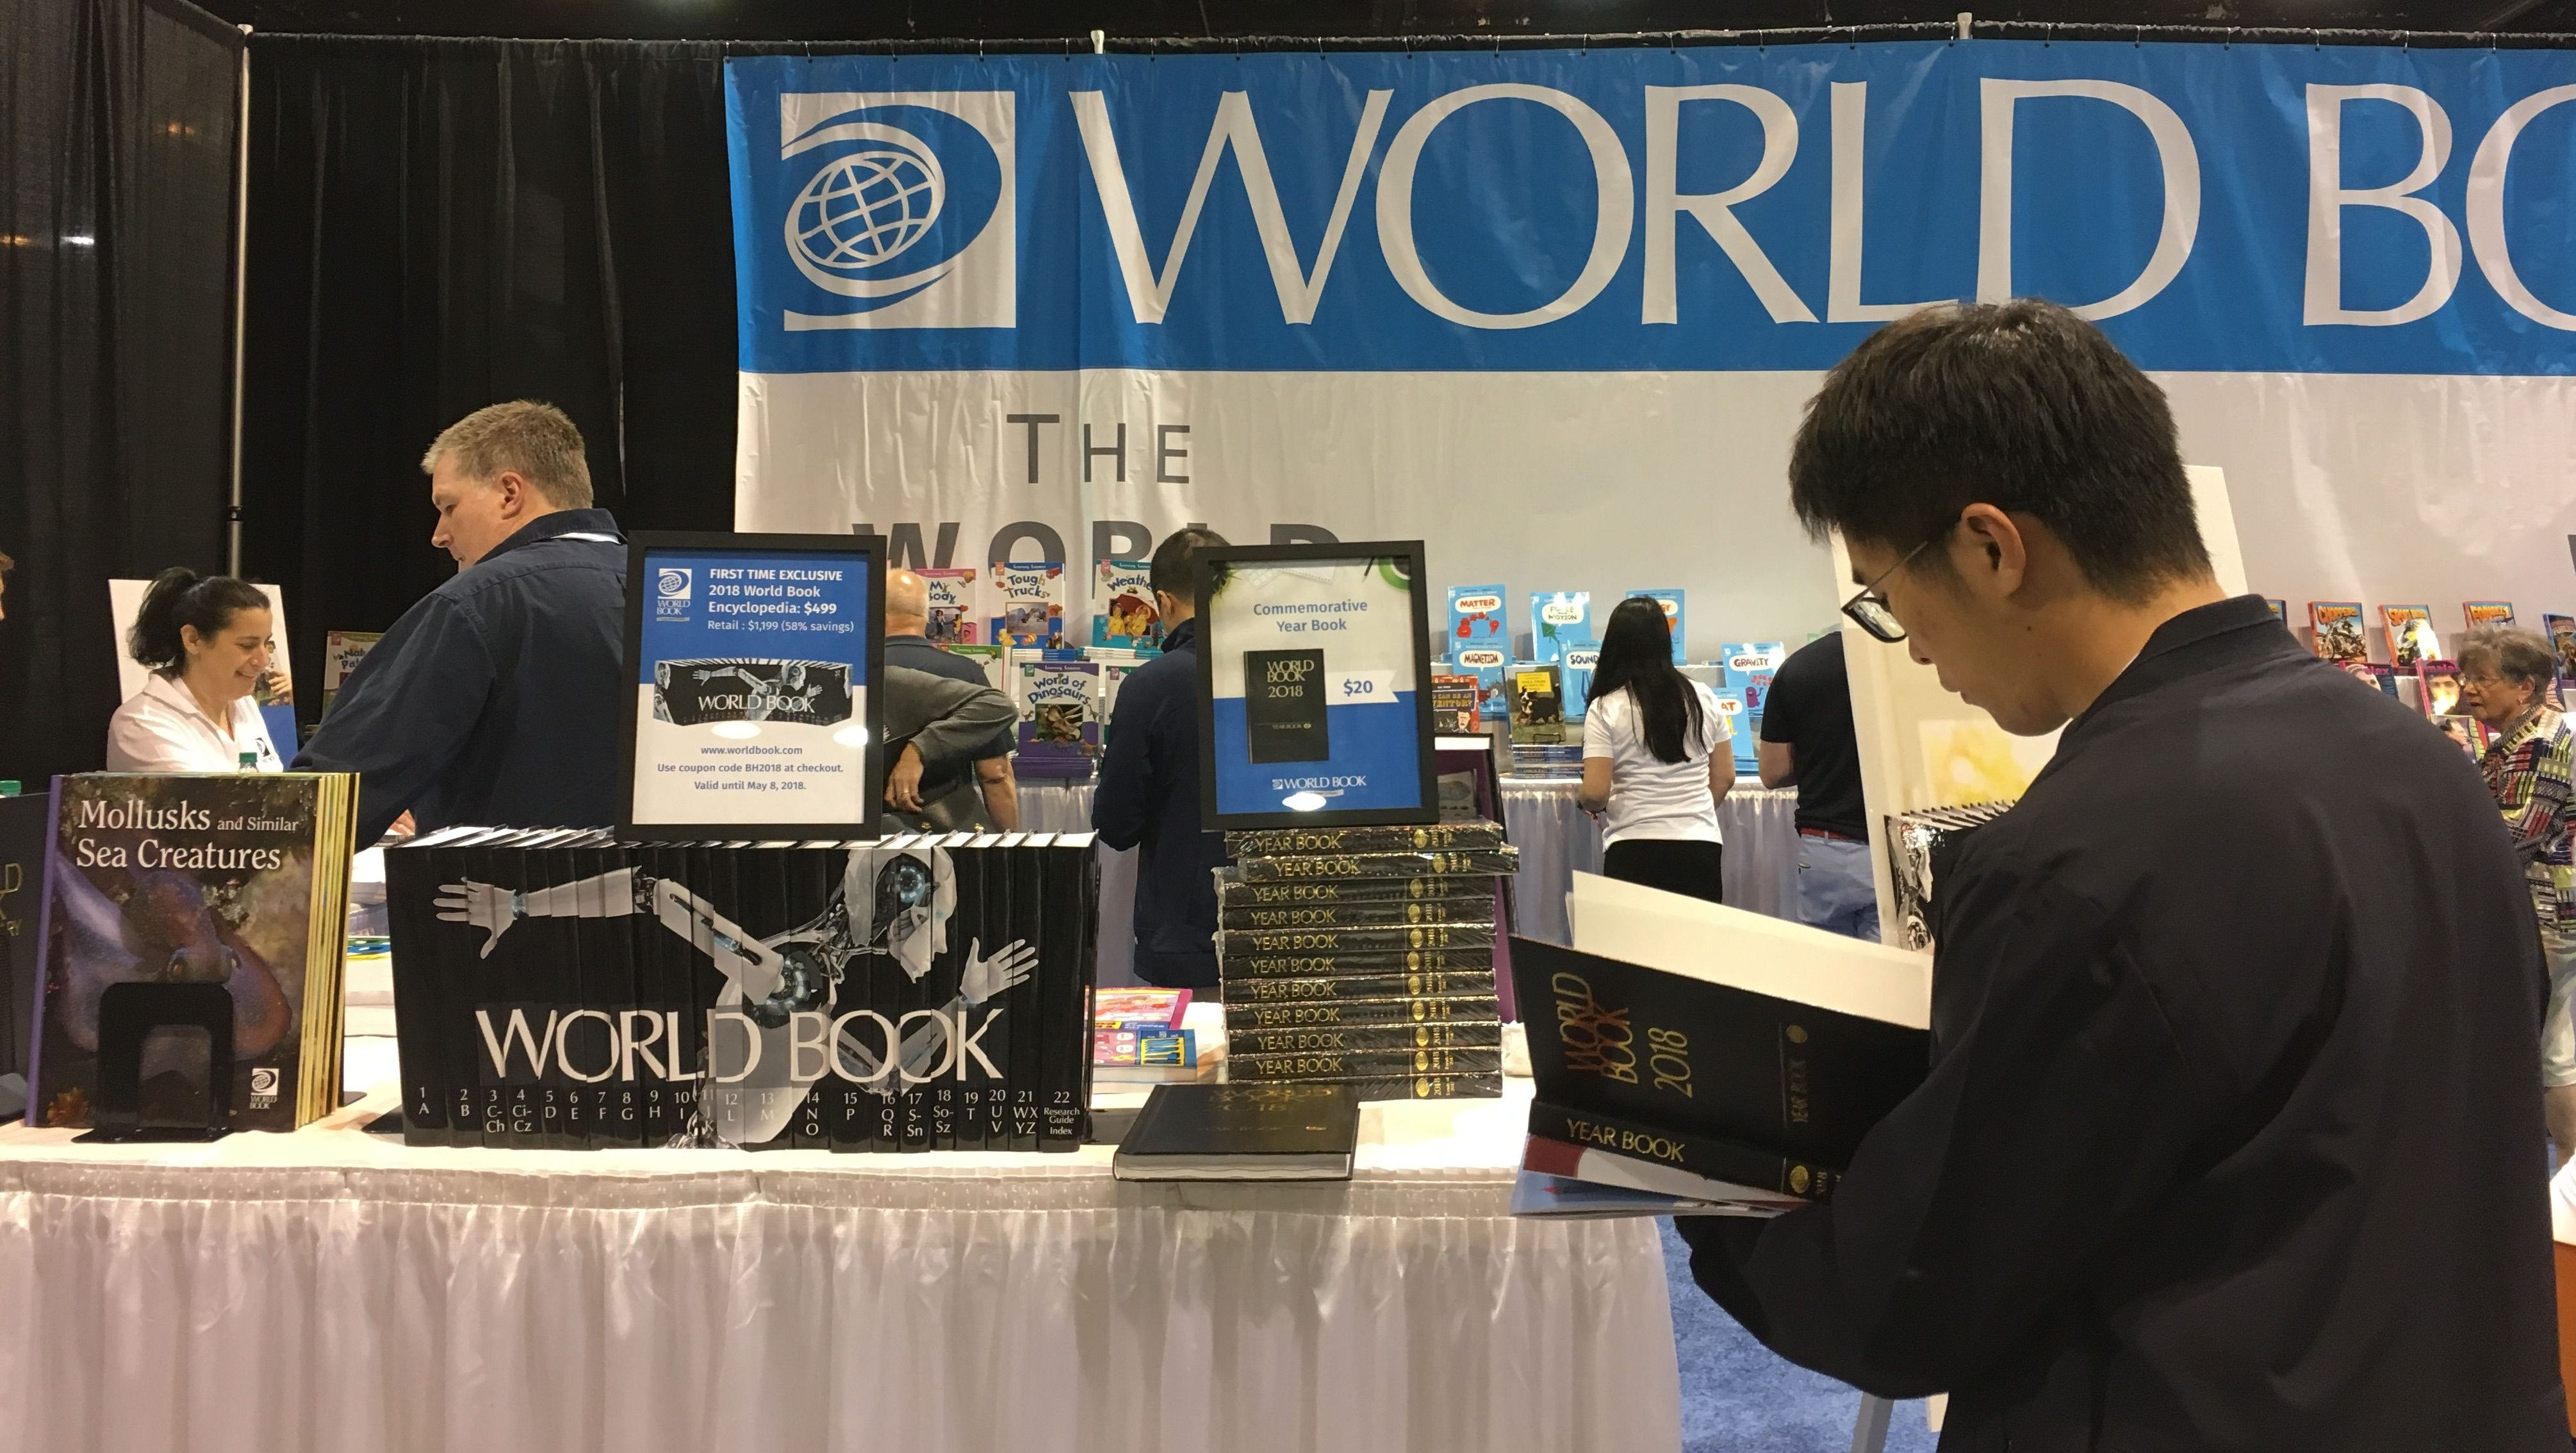 The World Book display at the Shareholder Shopping Day at the 2018 Berkshire Hathaway annual meeting, CenturyLink Center, Omaha, Nebraska, May 4, 2018.